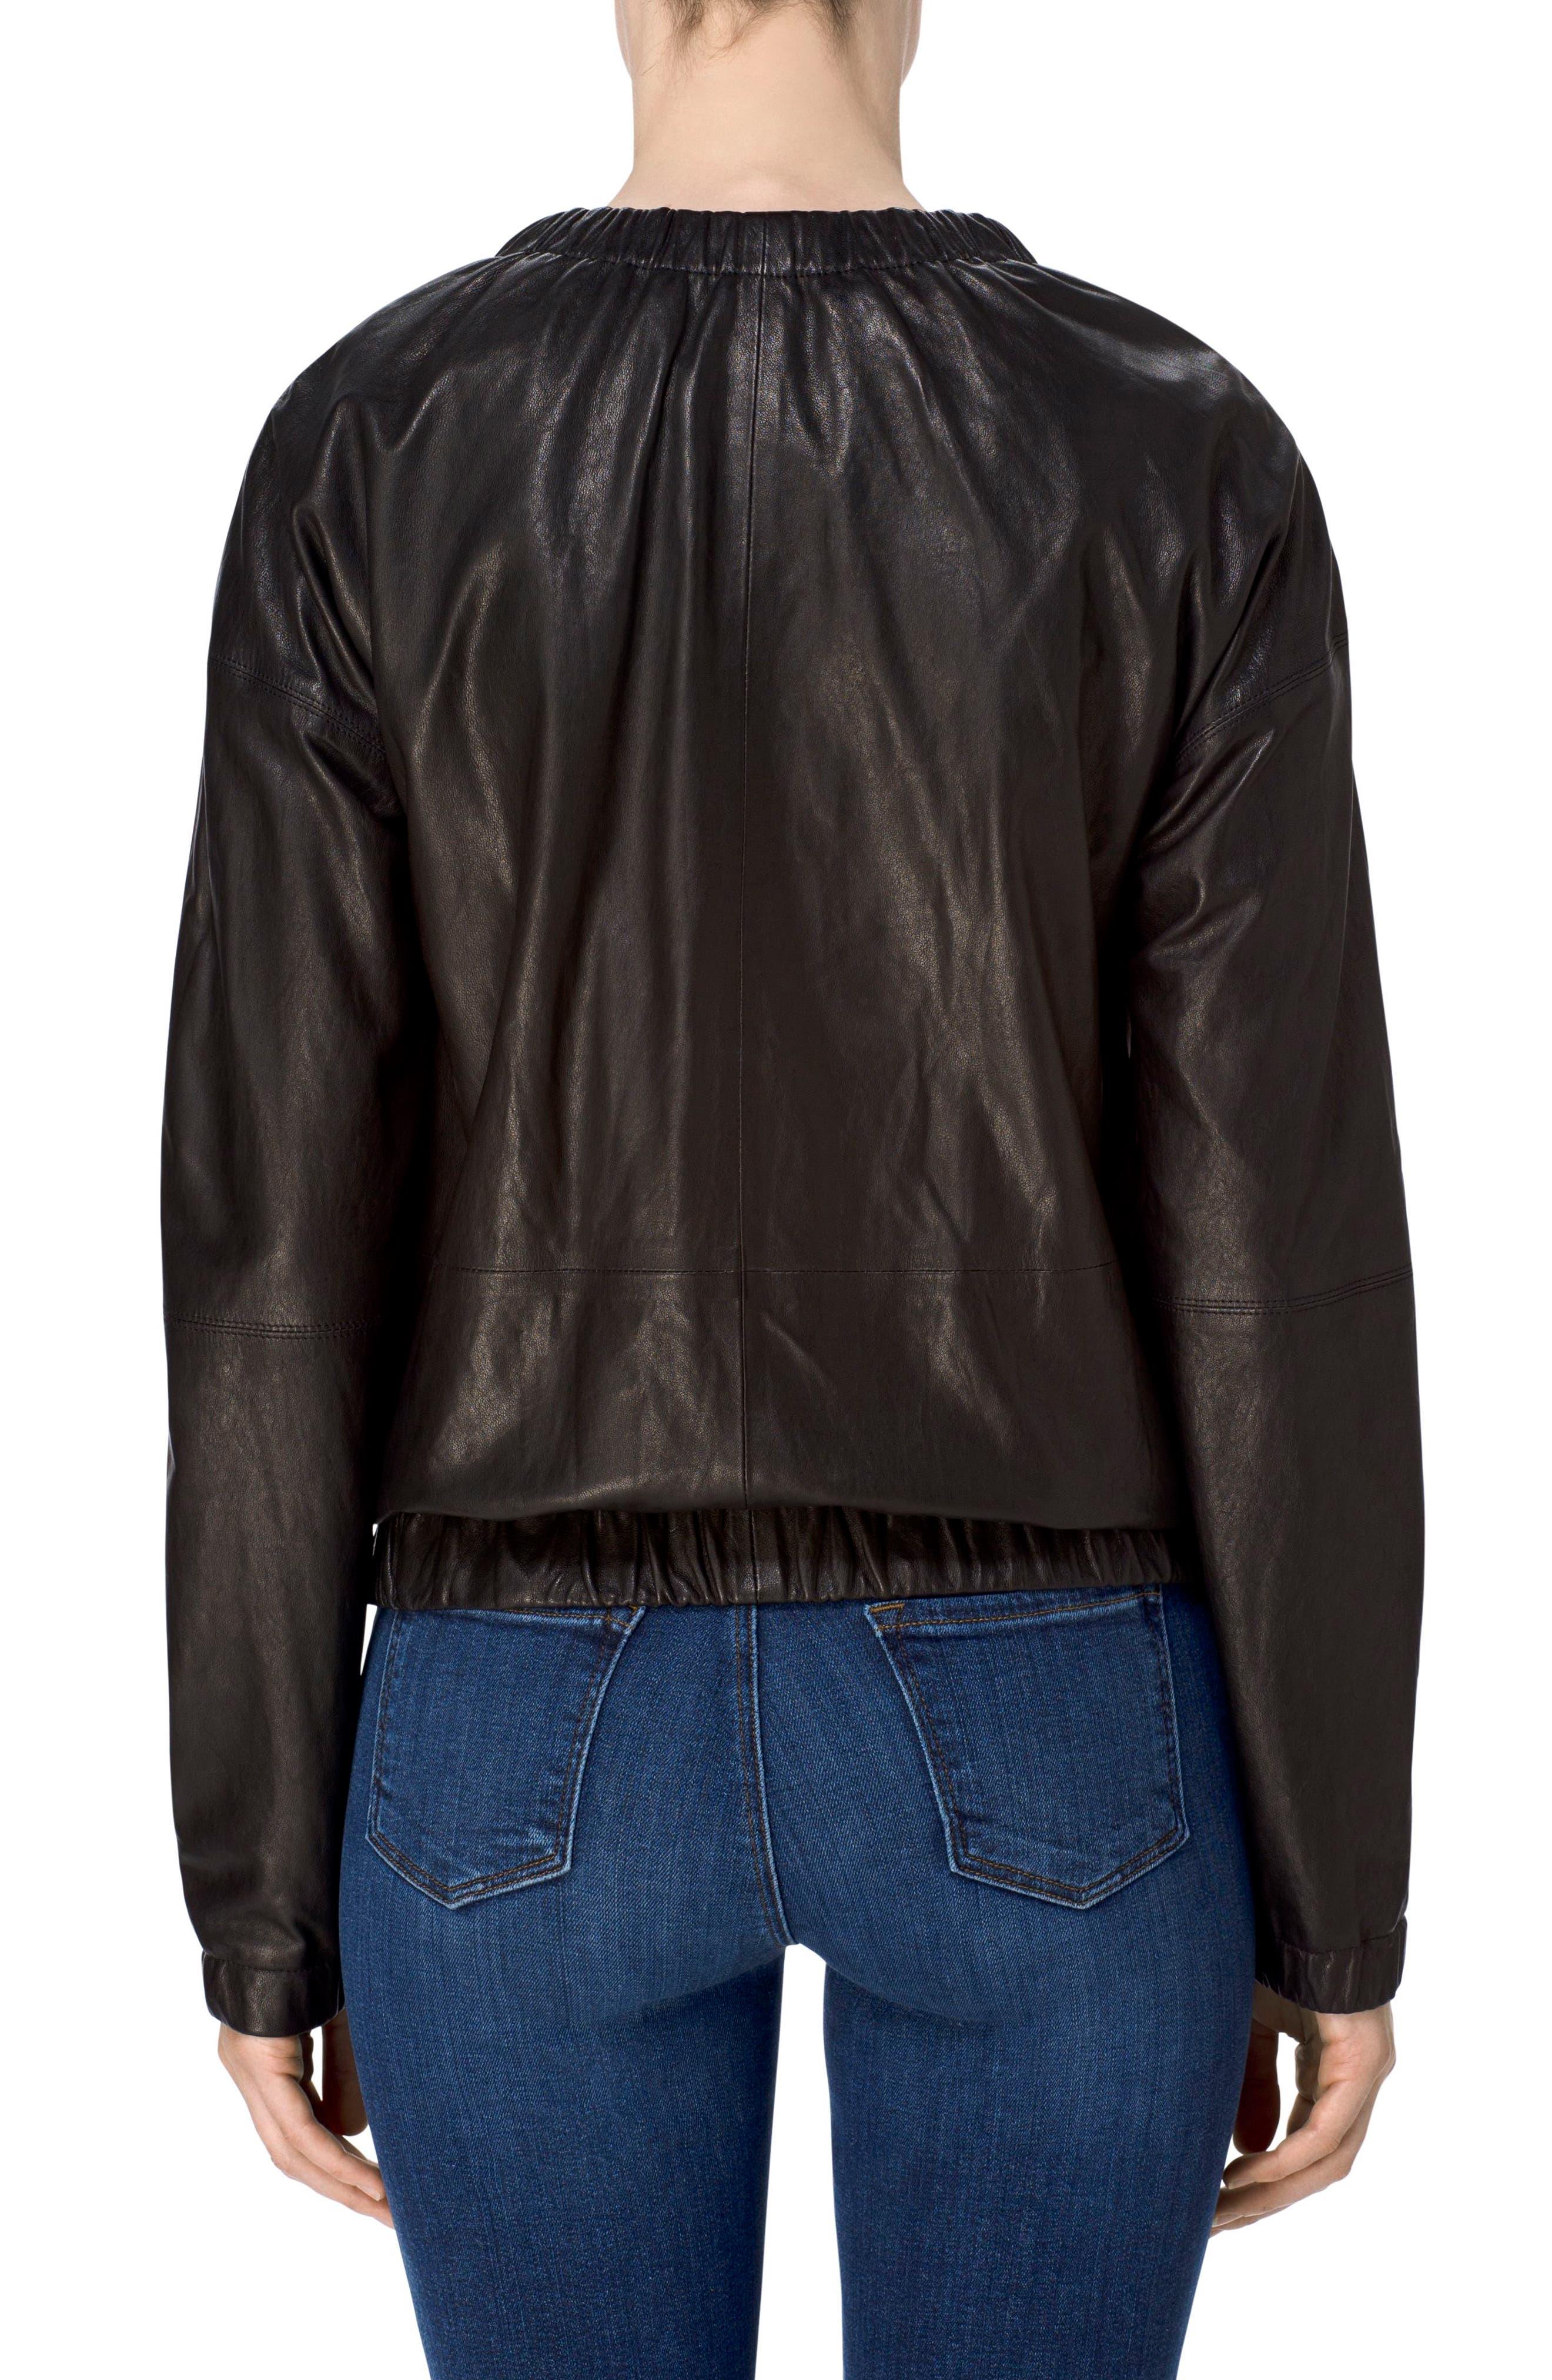 Baez Leather Bomber Jacket,                             Alternate thumbnail 2, color,                             Black